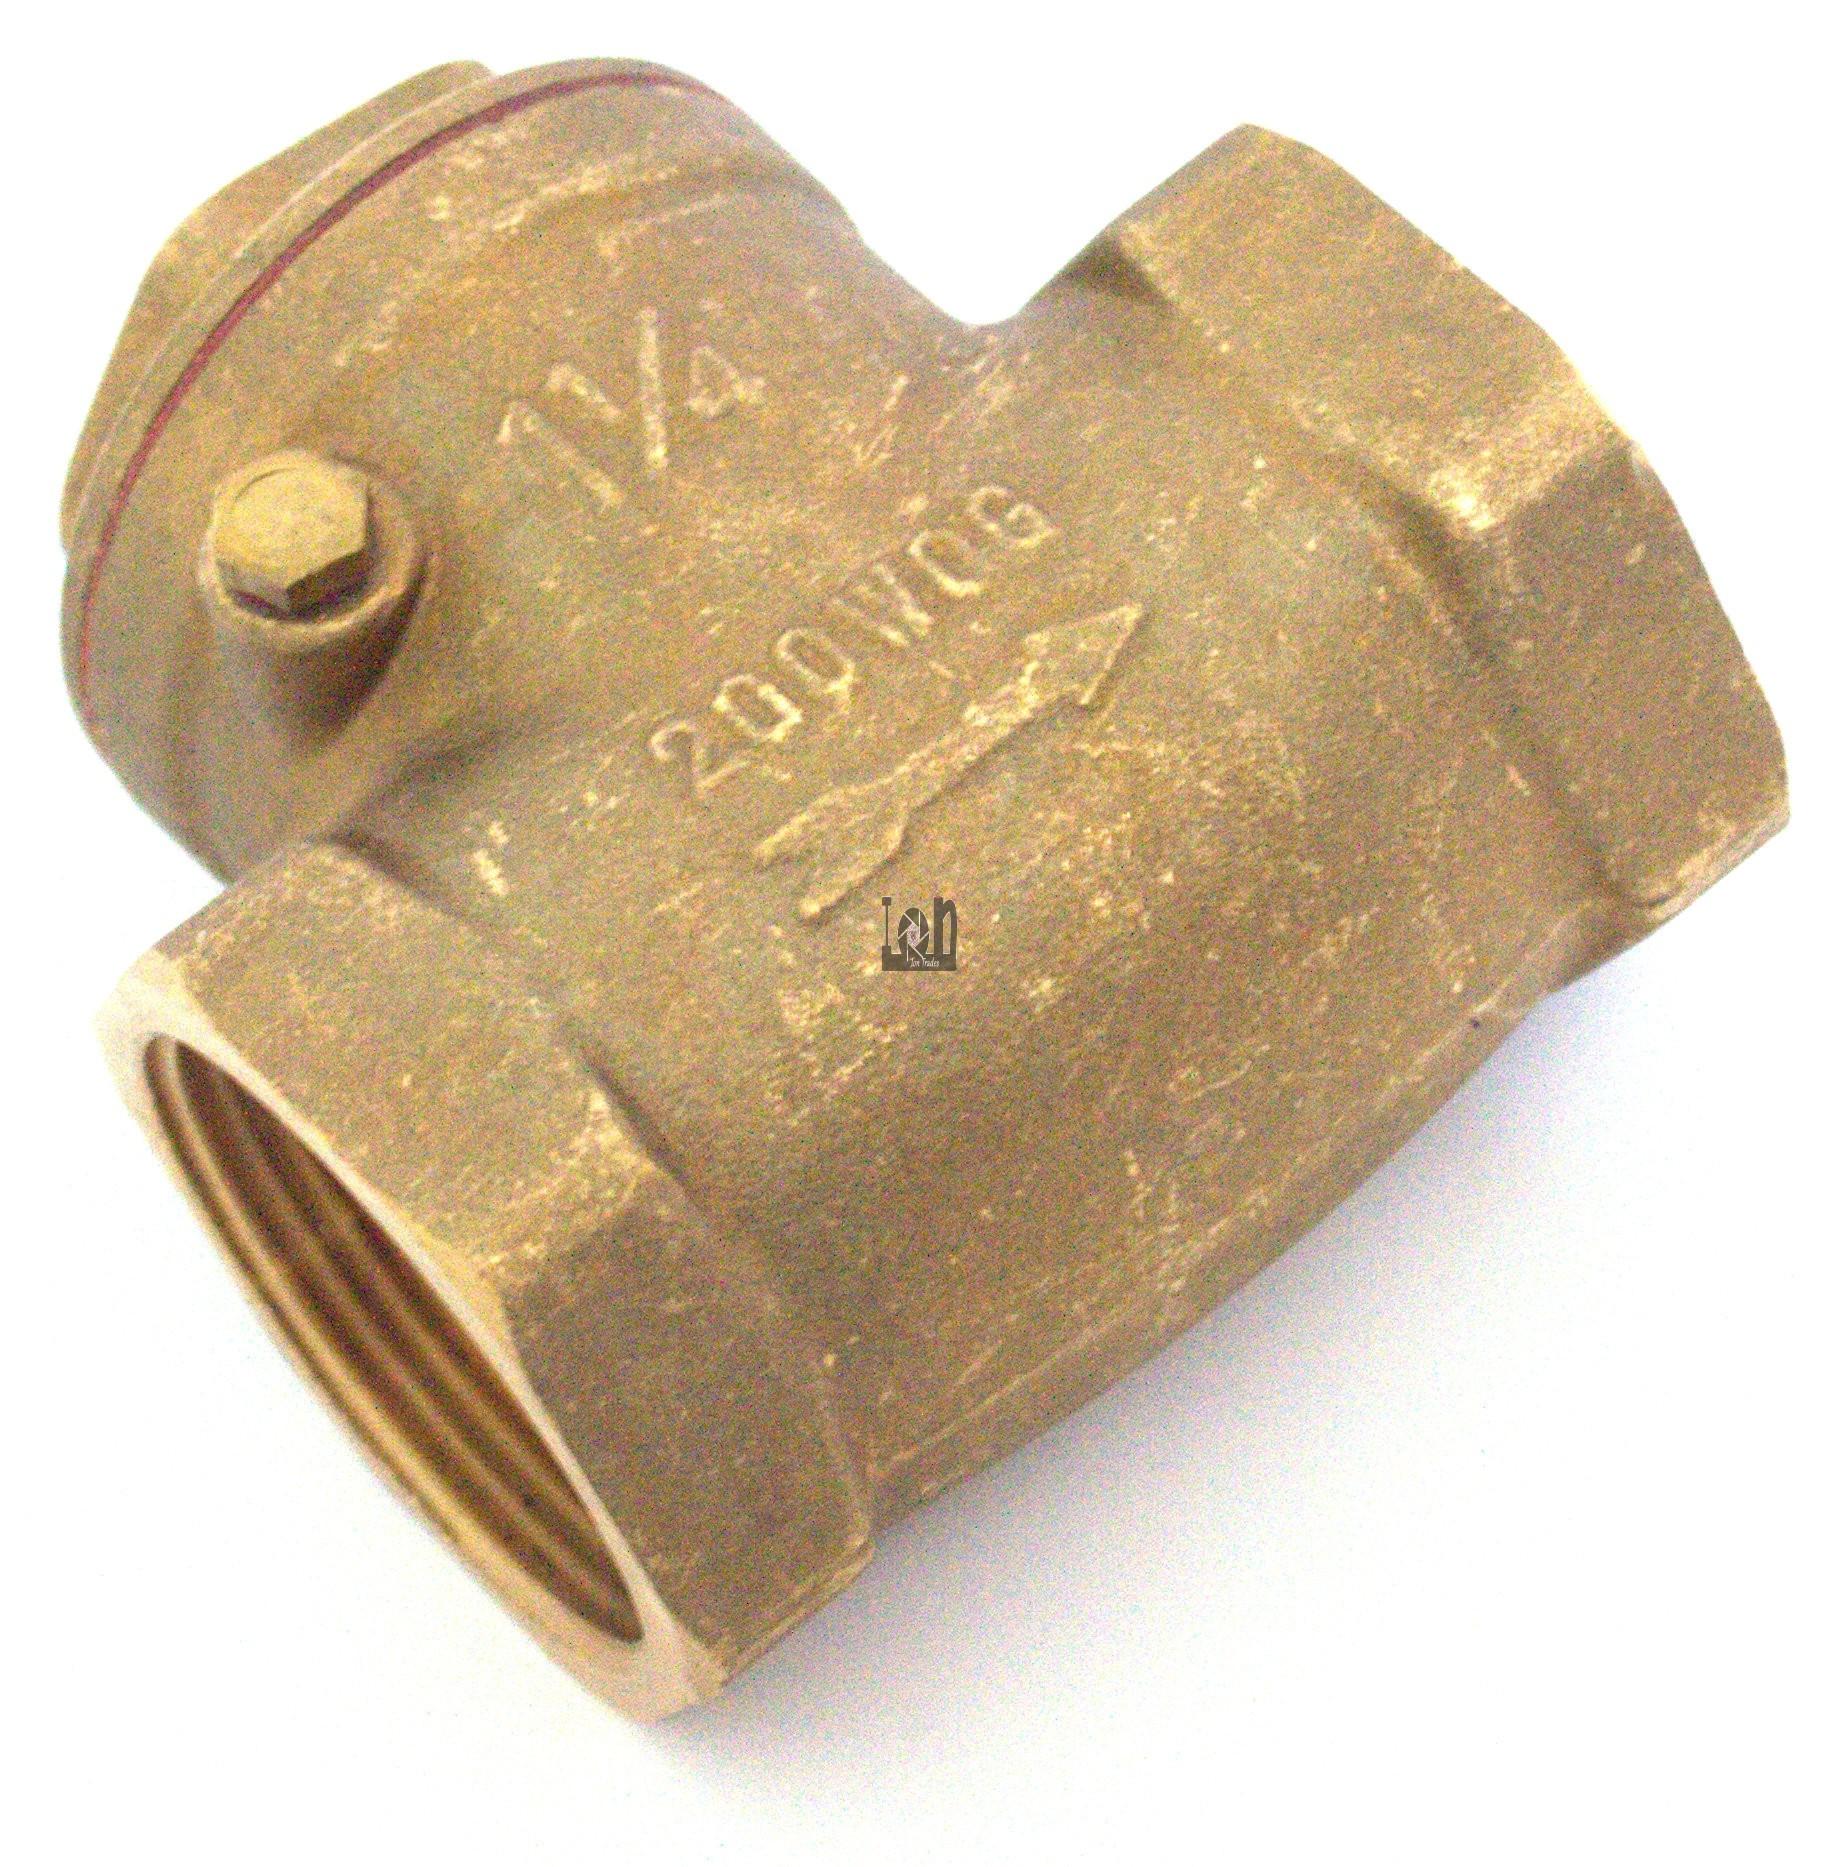 1-1/4NPT Brass Check Valve Female NPT 200WOG